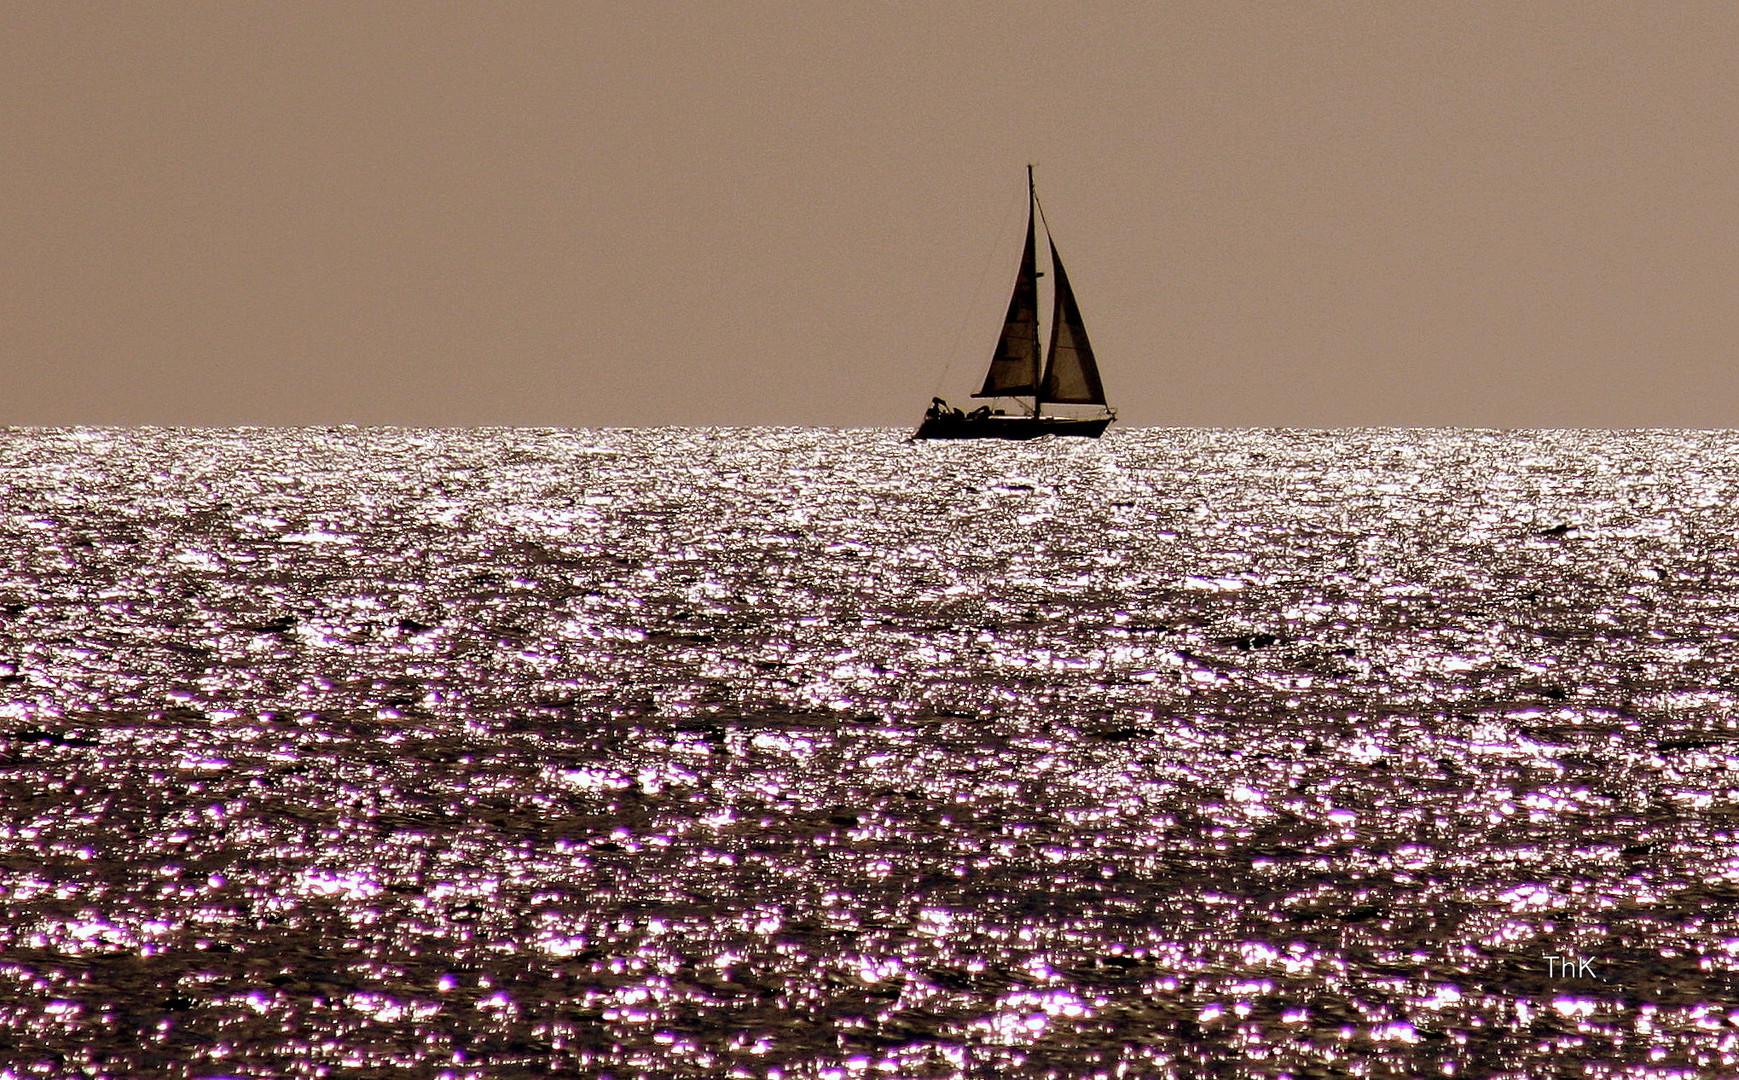 Romantik auf See.